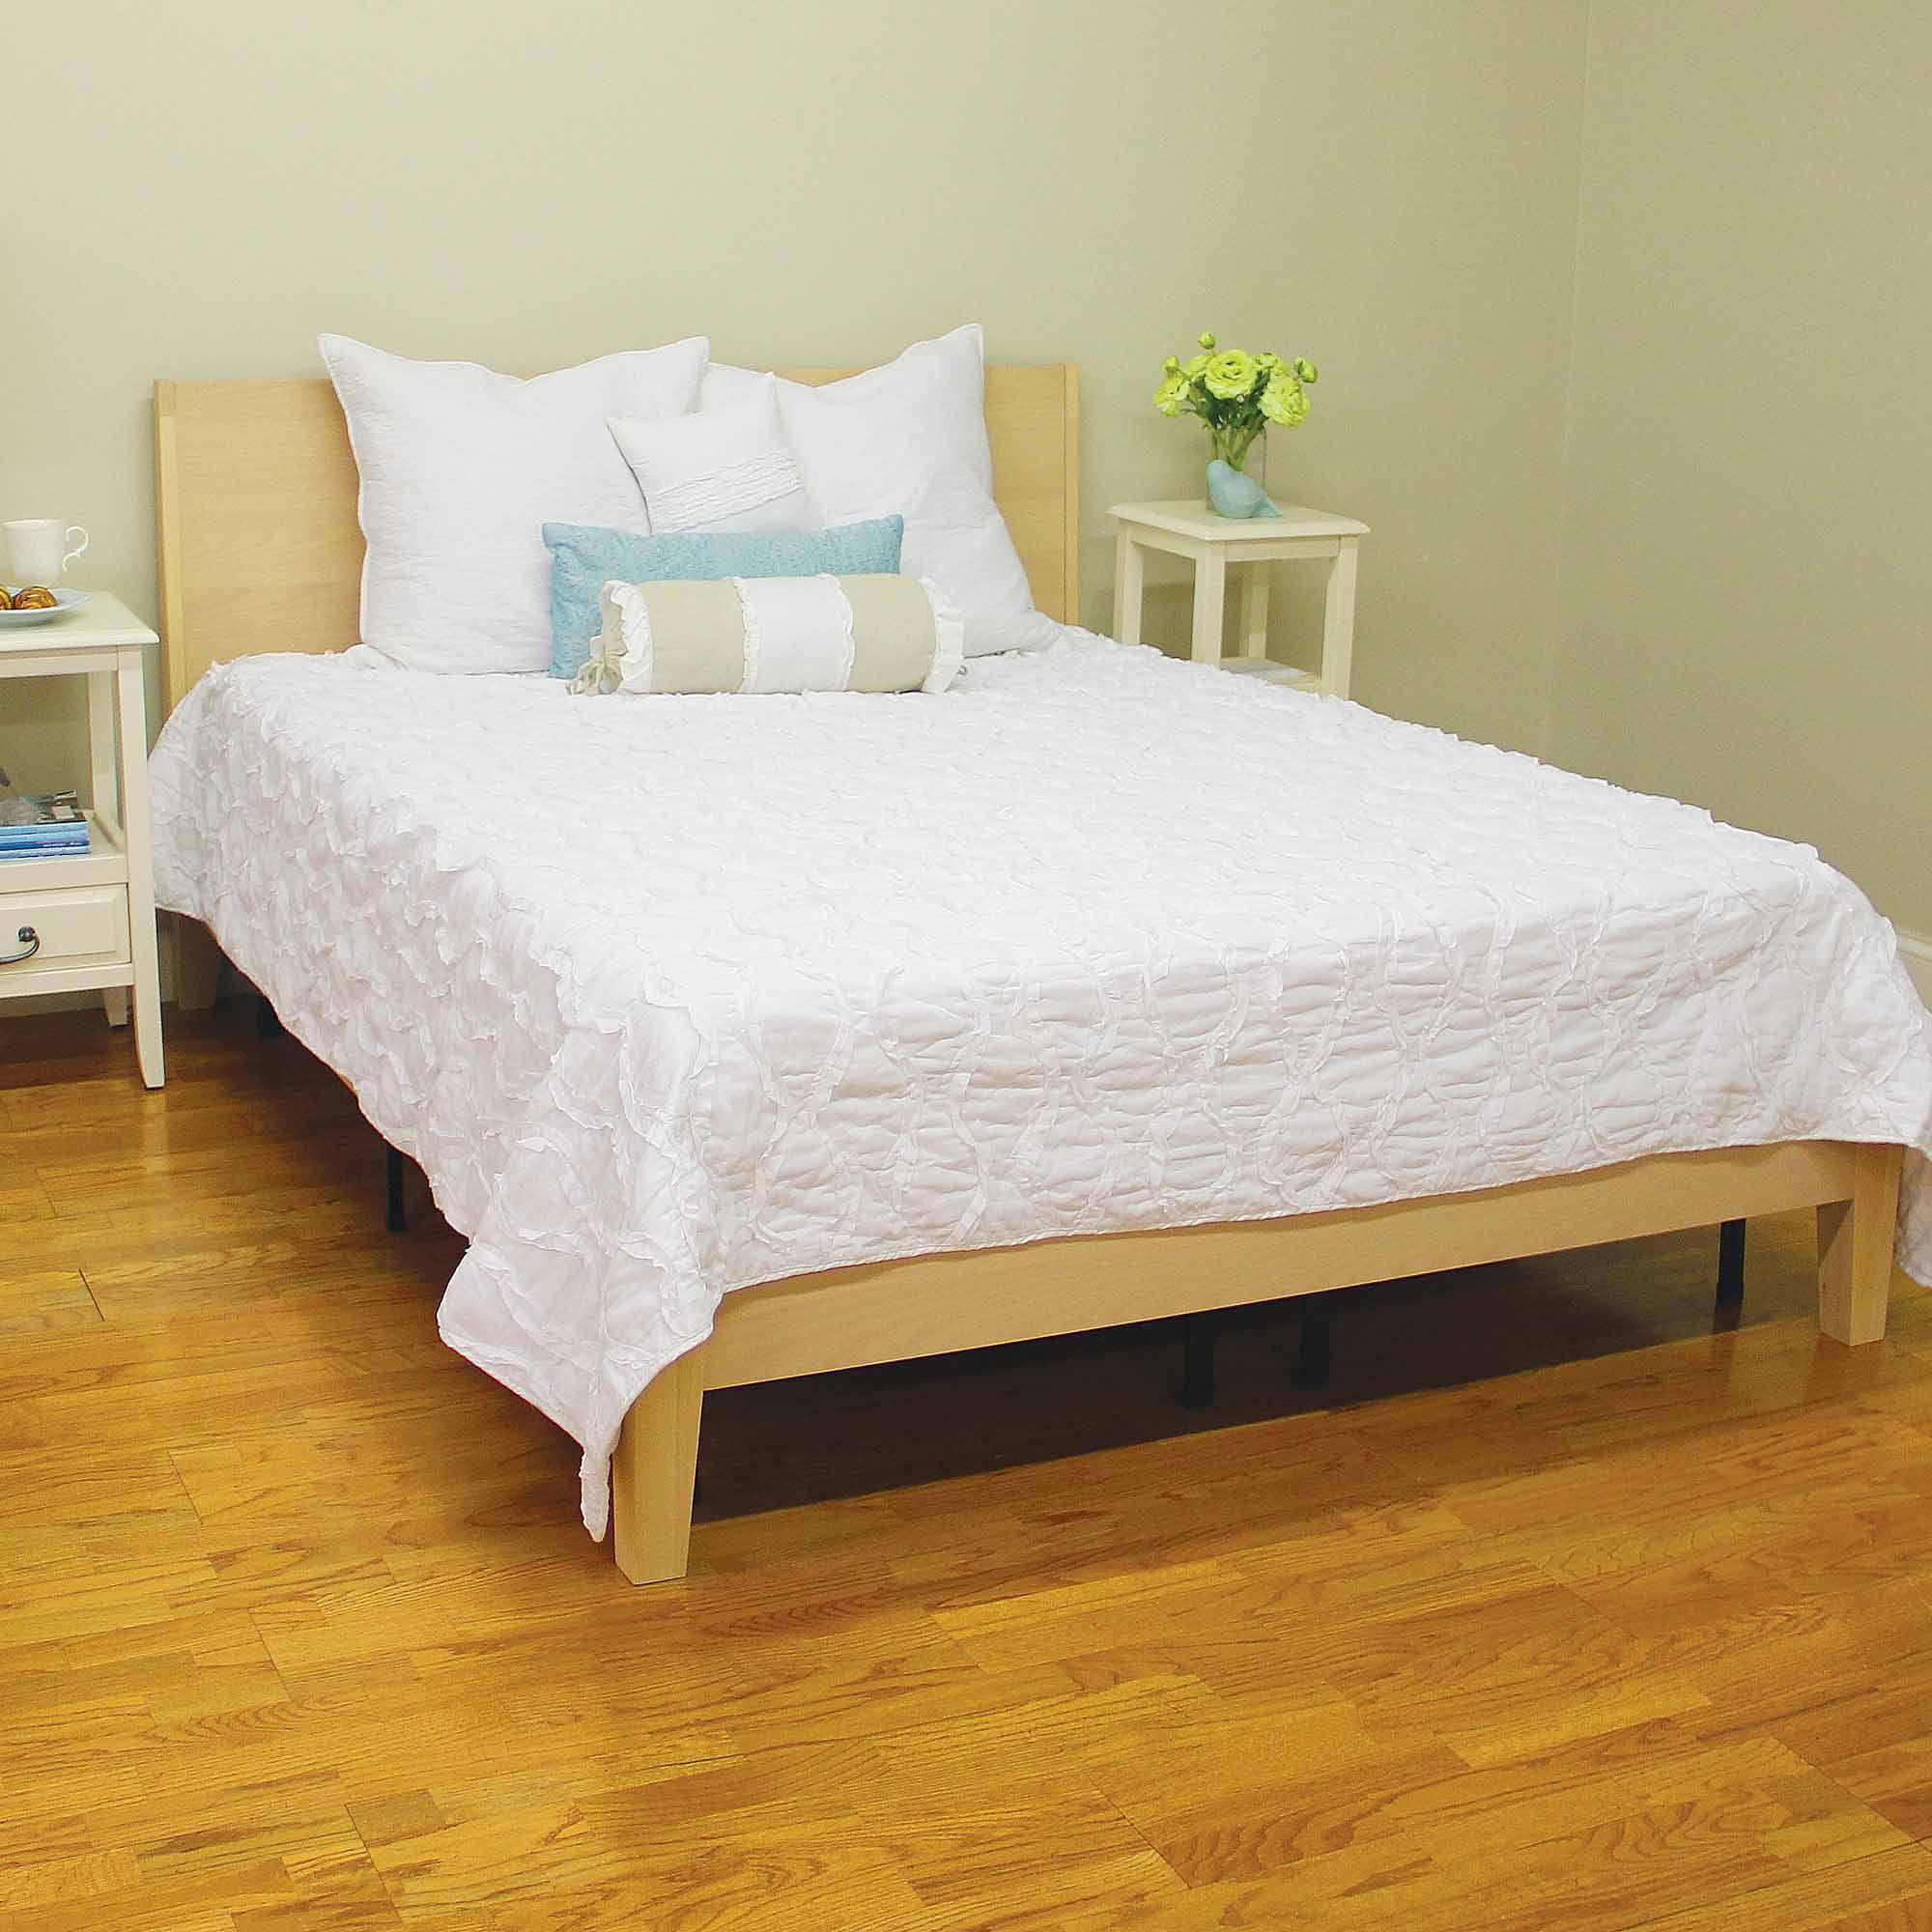 Modern Metal Bed Frames modern sleep platform metal bed frame mattress foundation